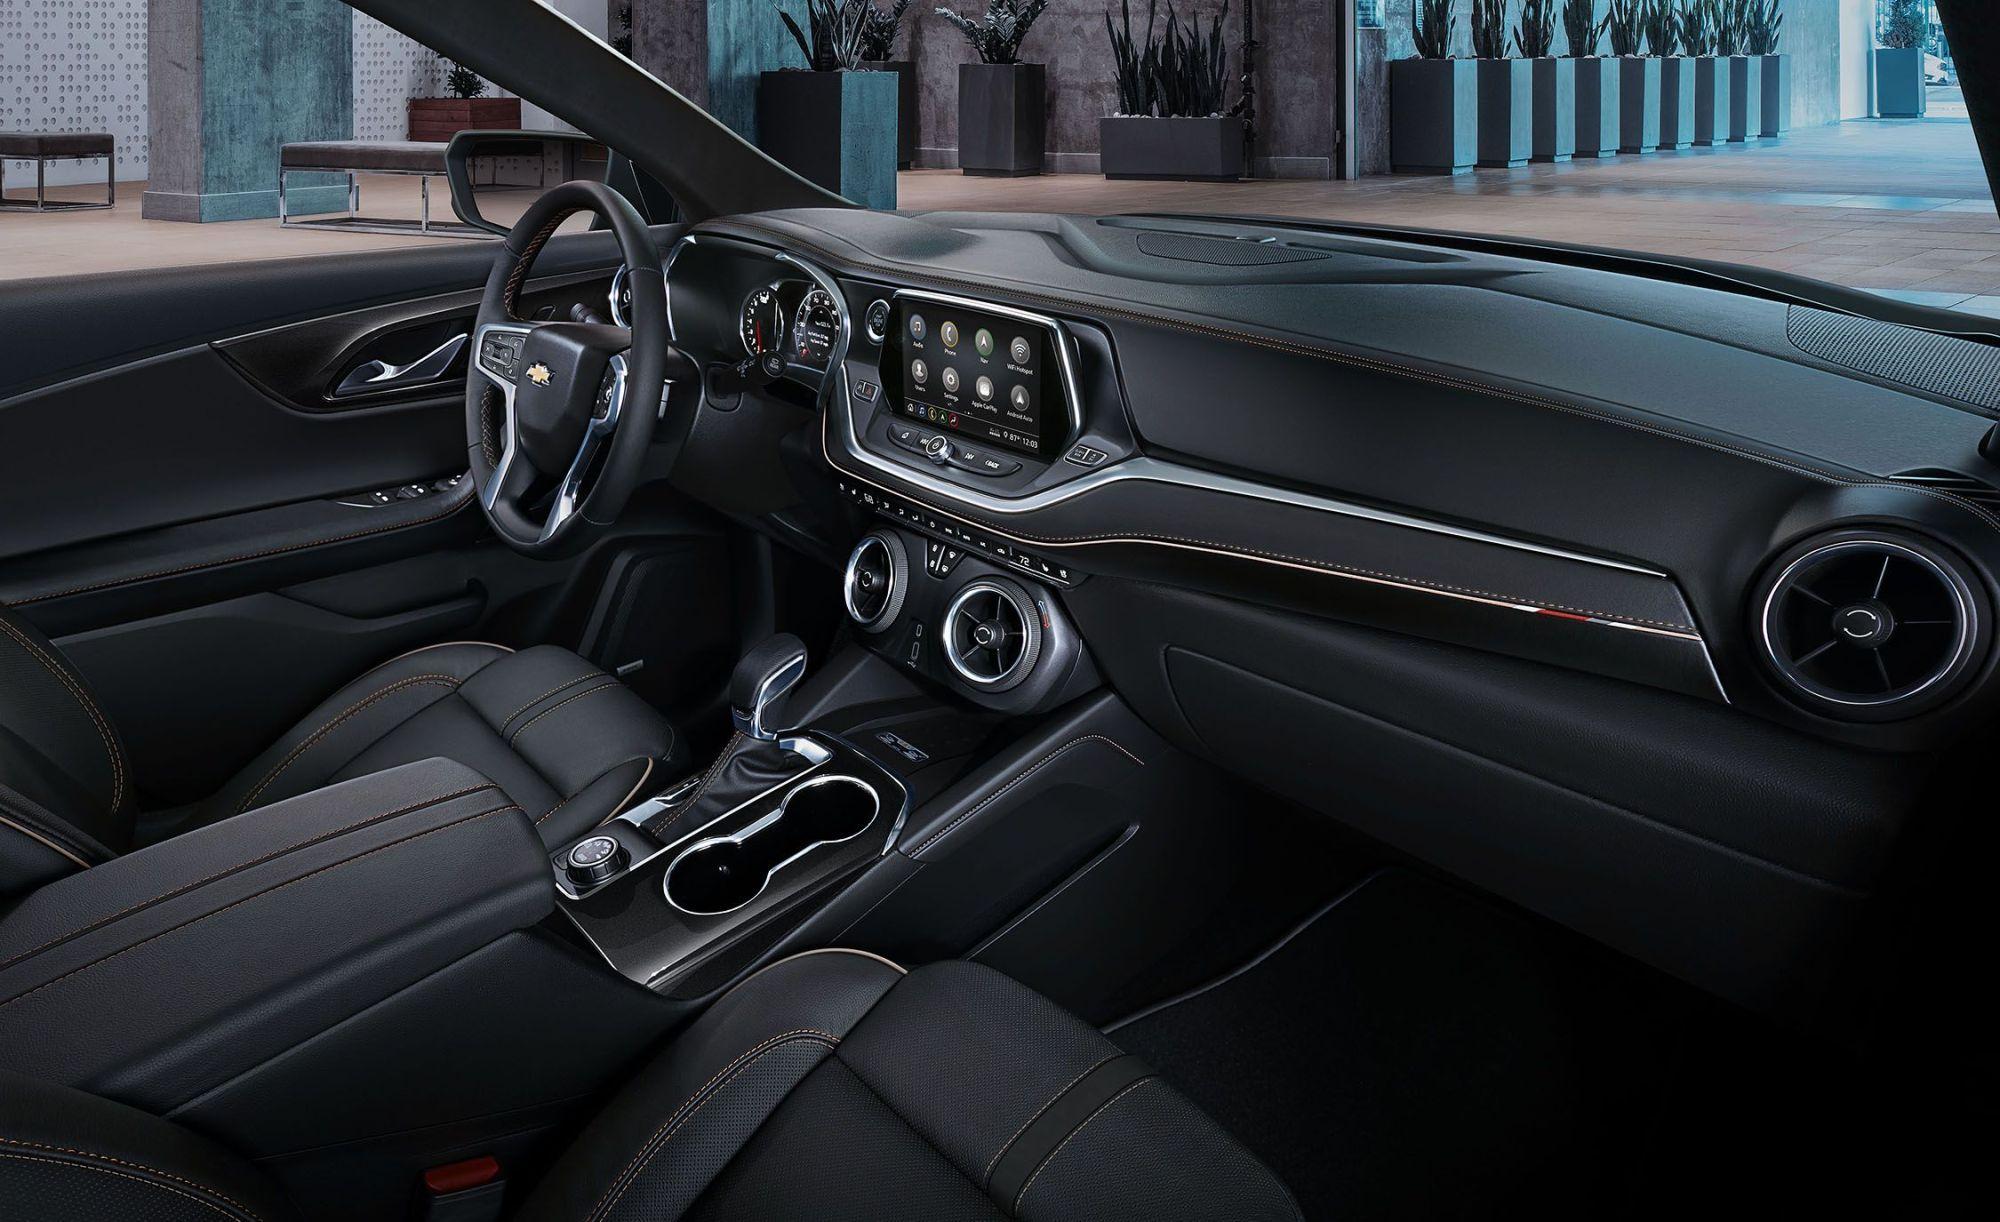 hight resolution of chevrolet blazer reviews chevrolet blazer price photos and specs car and driver